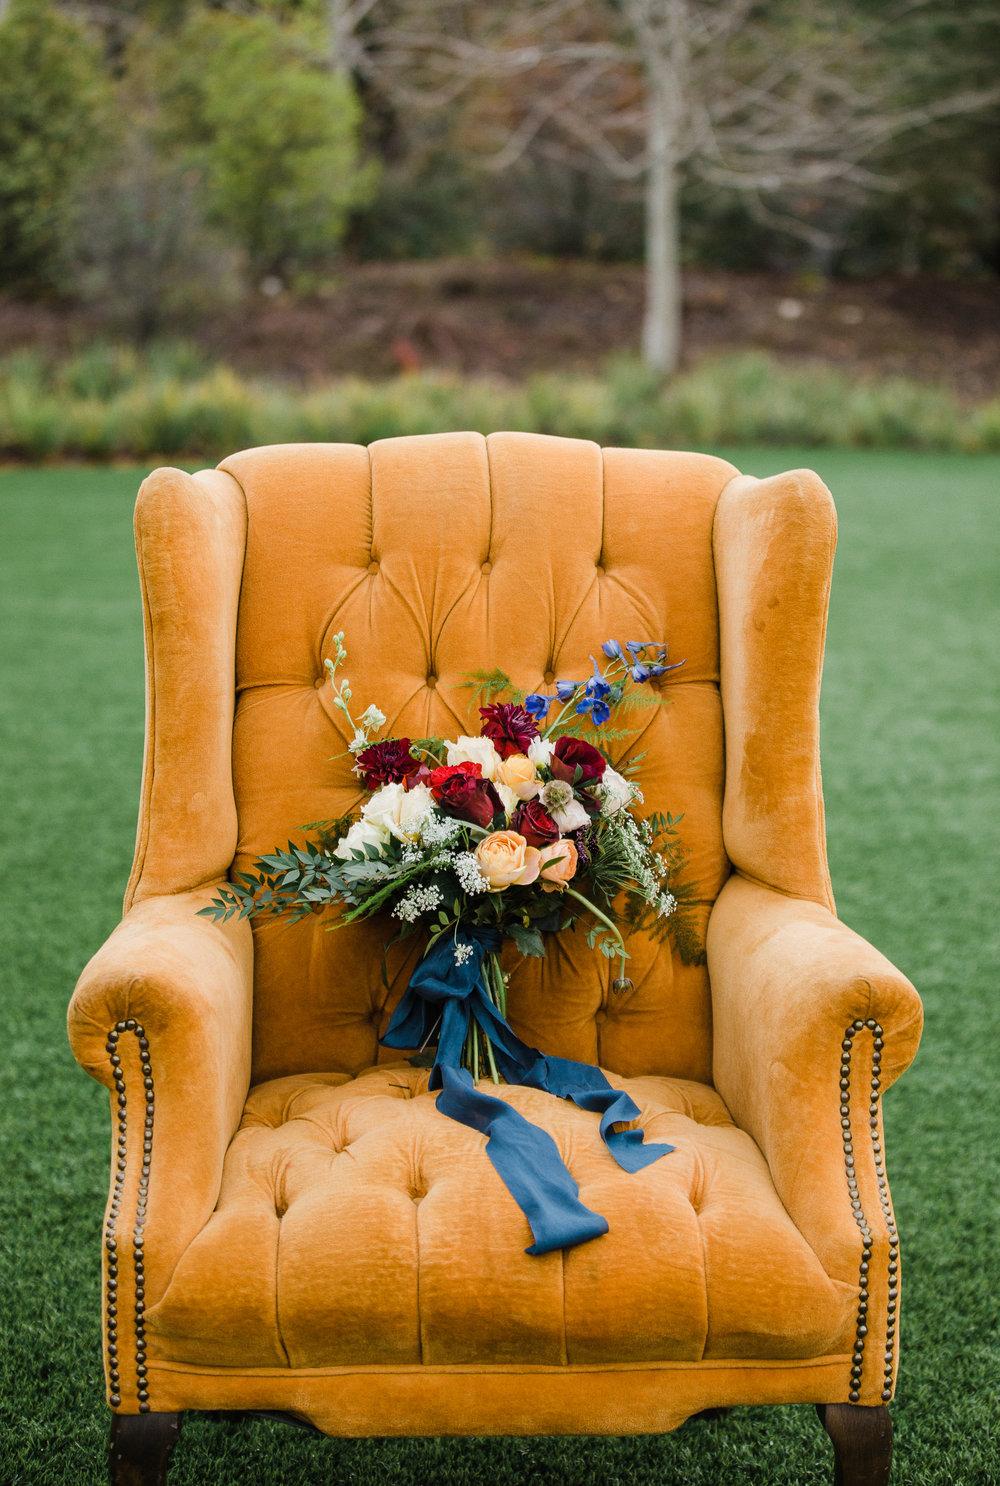 www.santabarbarawedding.com | Los Robles Greens | Besame Floral Events | Rachel Birkhofer | Styled Shoot | Bridal Bouquet